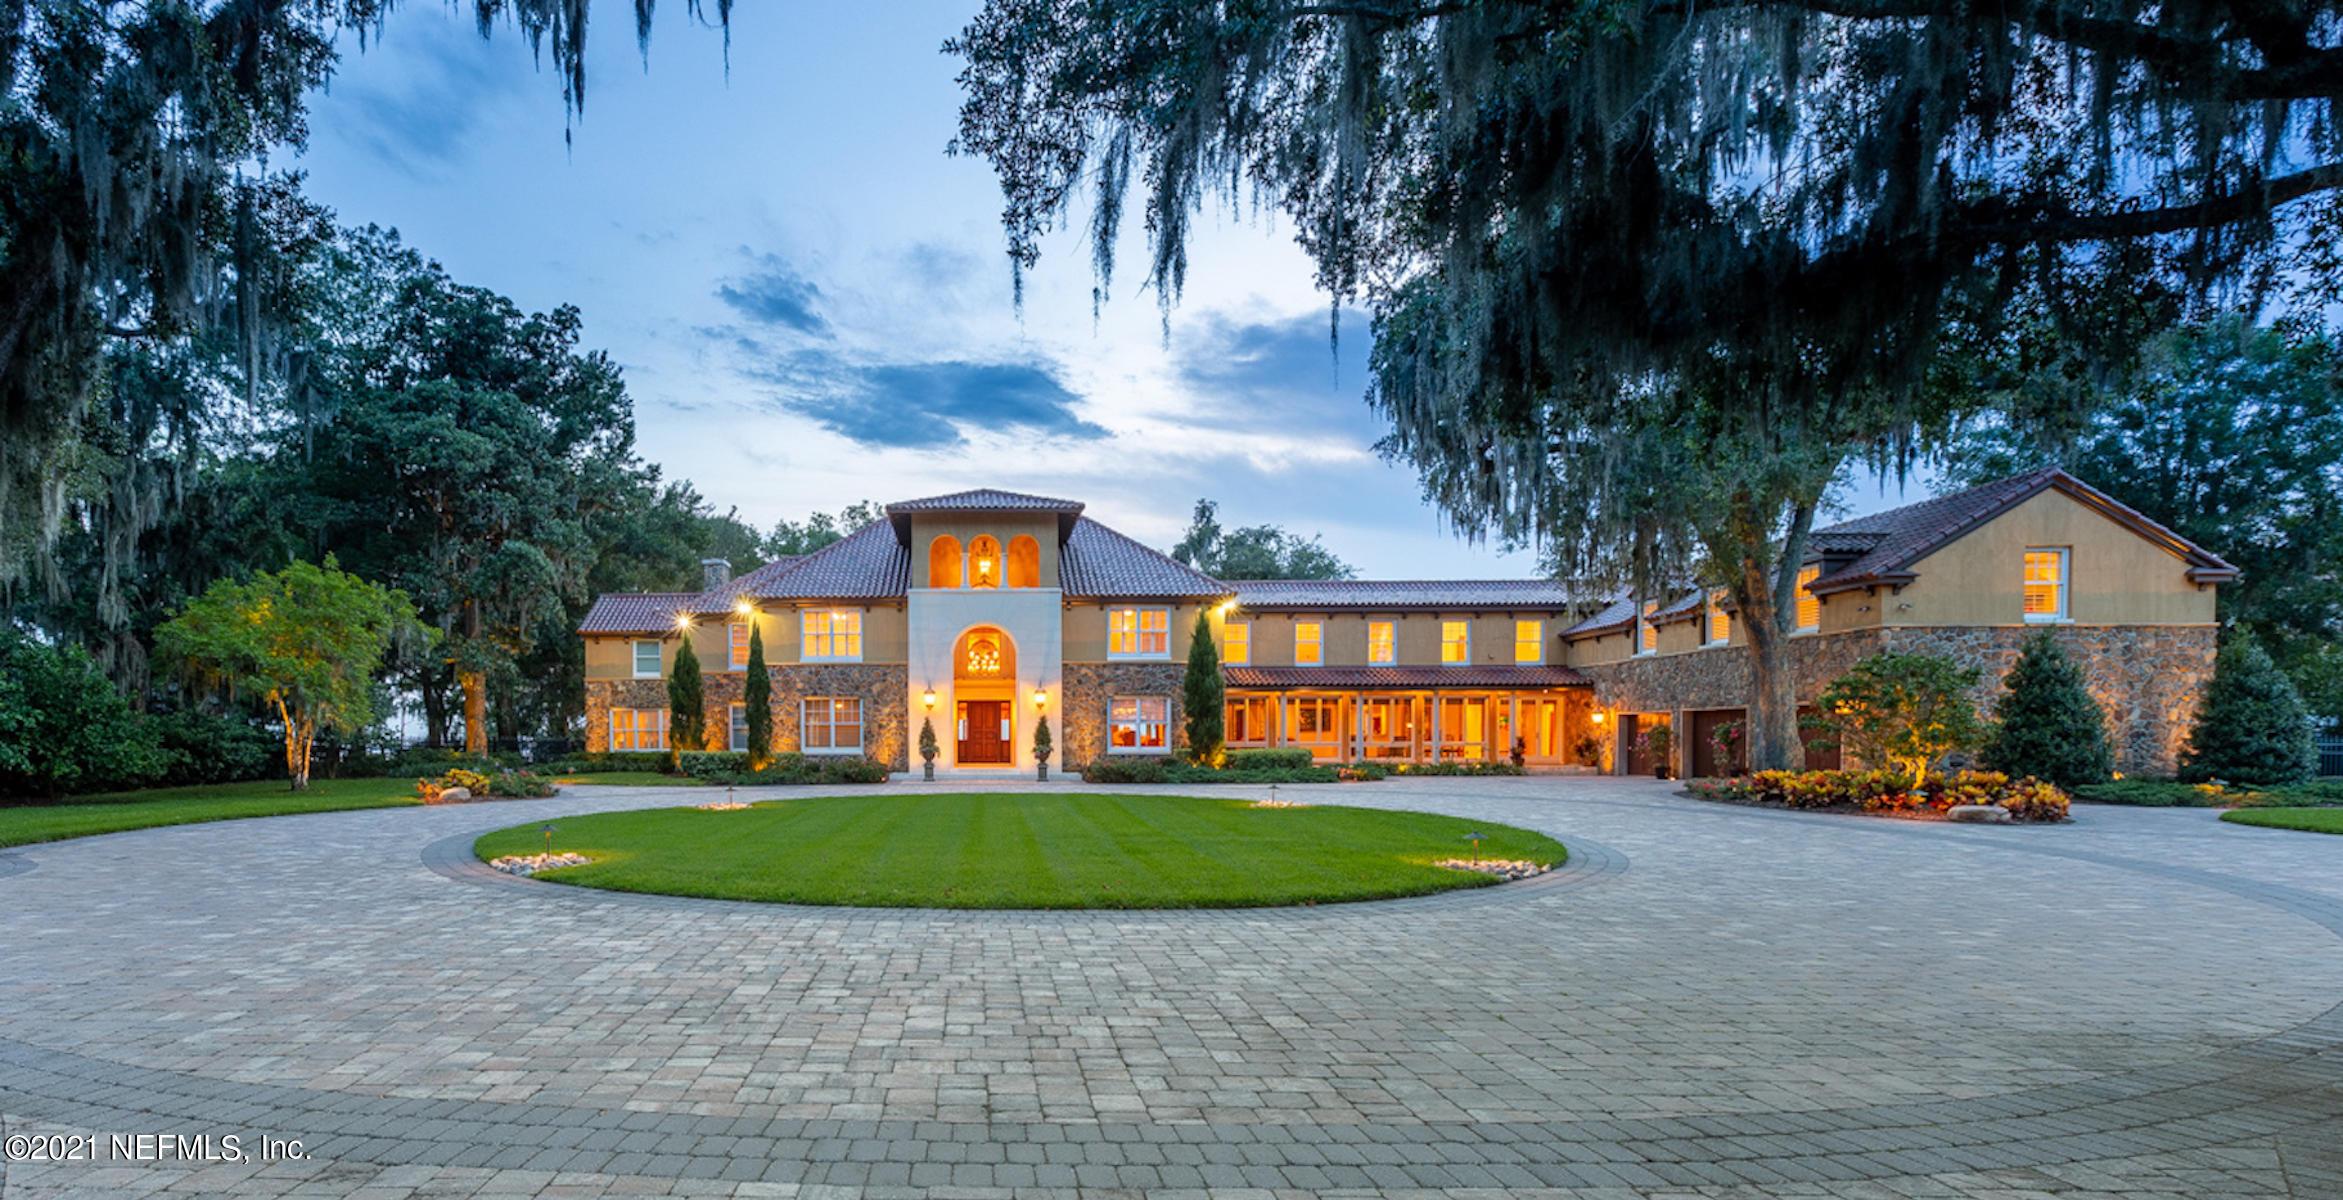 8652 CATHEDRAL OAKS, JACKSONVILLE, FLORIDA 32217, 5 Bedrooms Bedrooms, ,6 BathroomsBathrooms,Rental,For Rent,CATHEDRAL OAKS,1122271